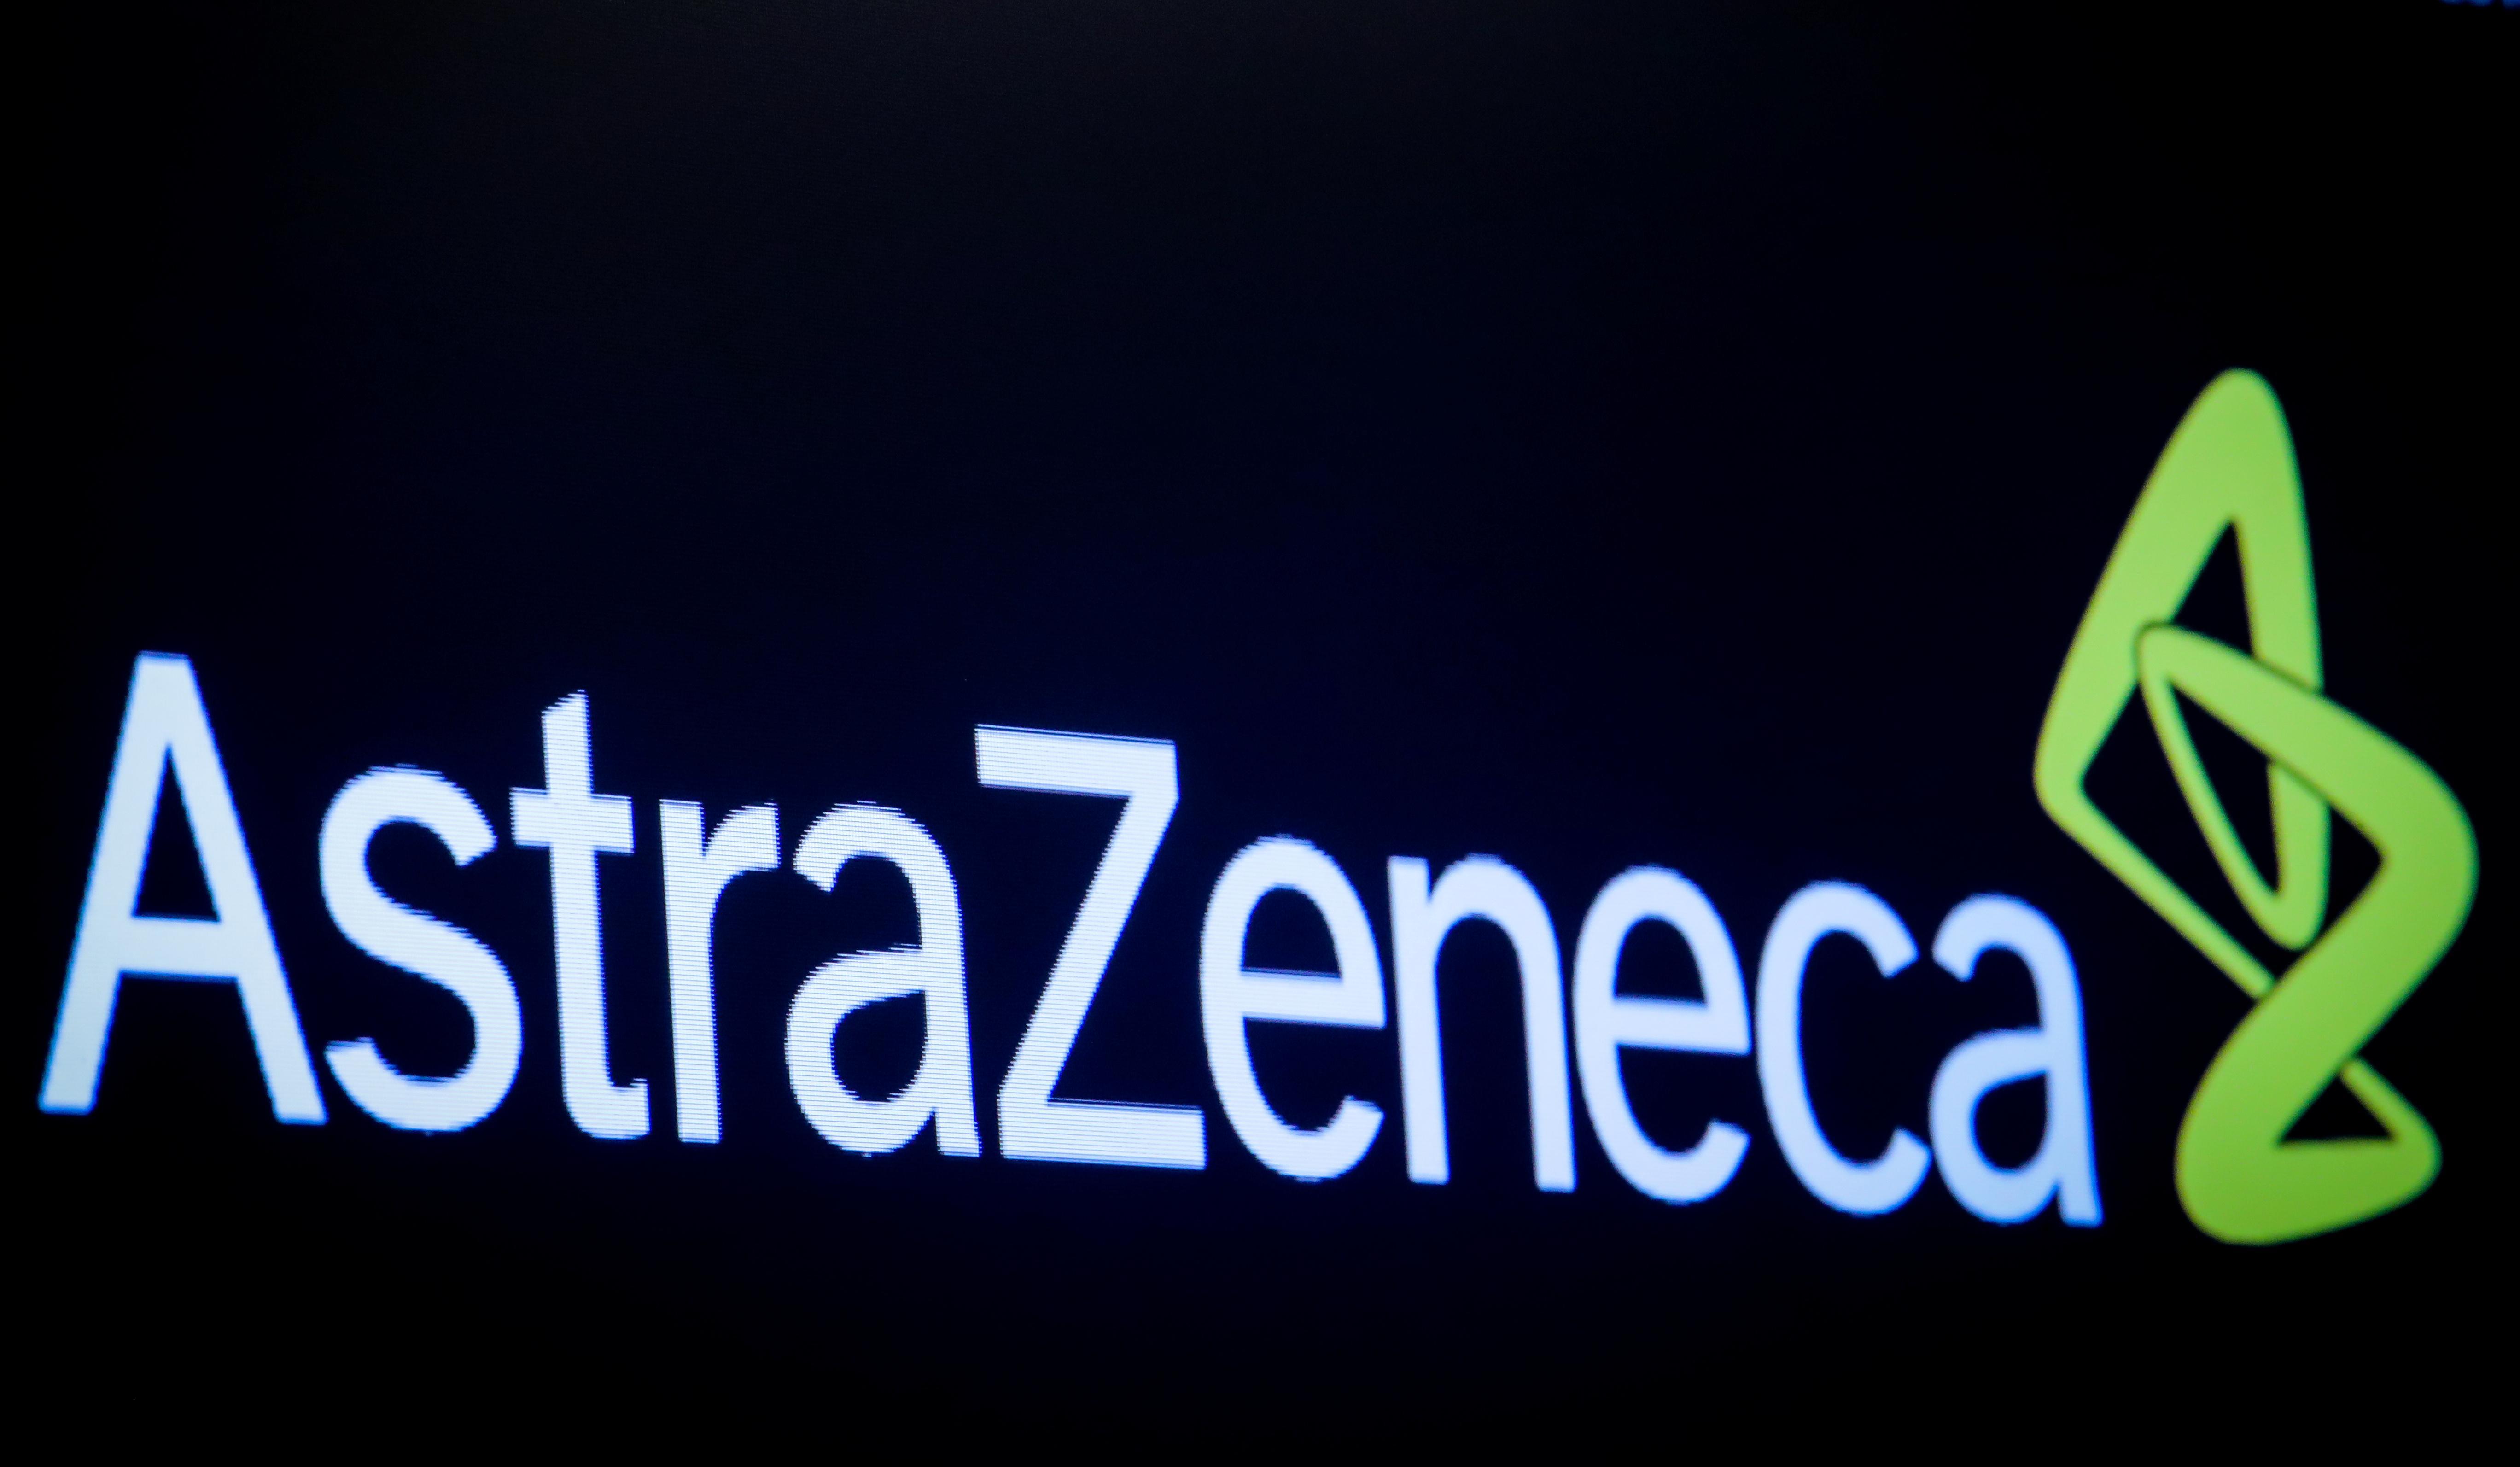 AstraZeneca diabetes drug shows promise in heart failure